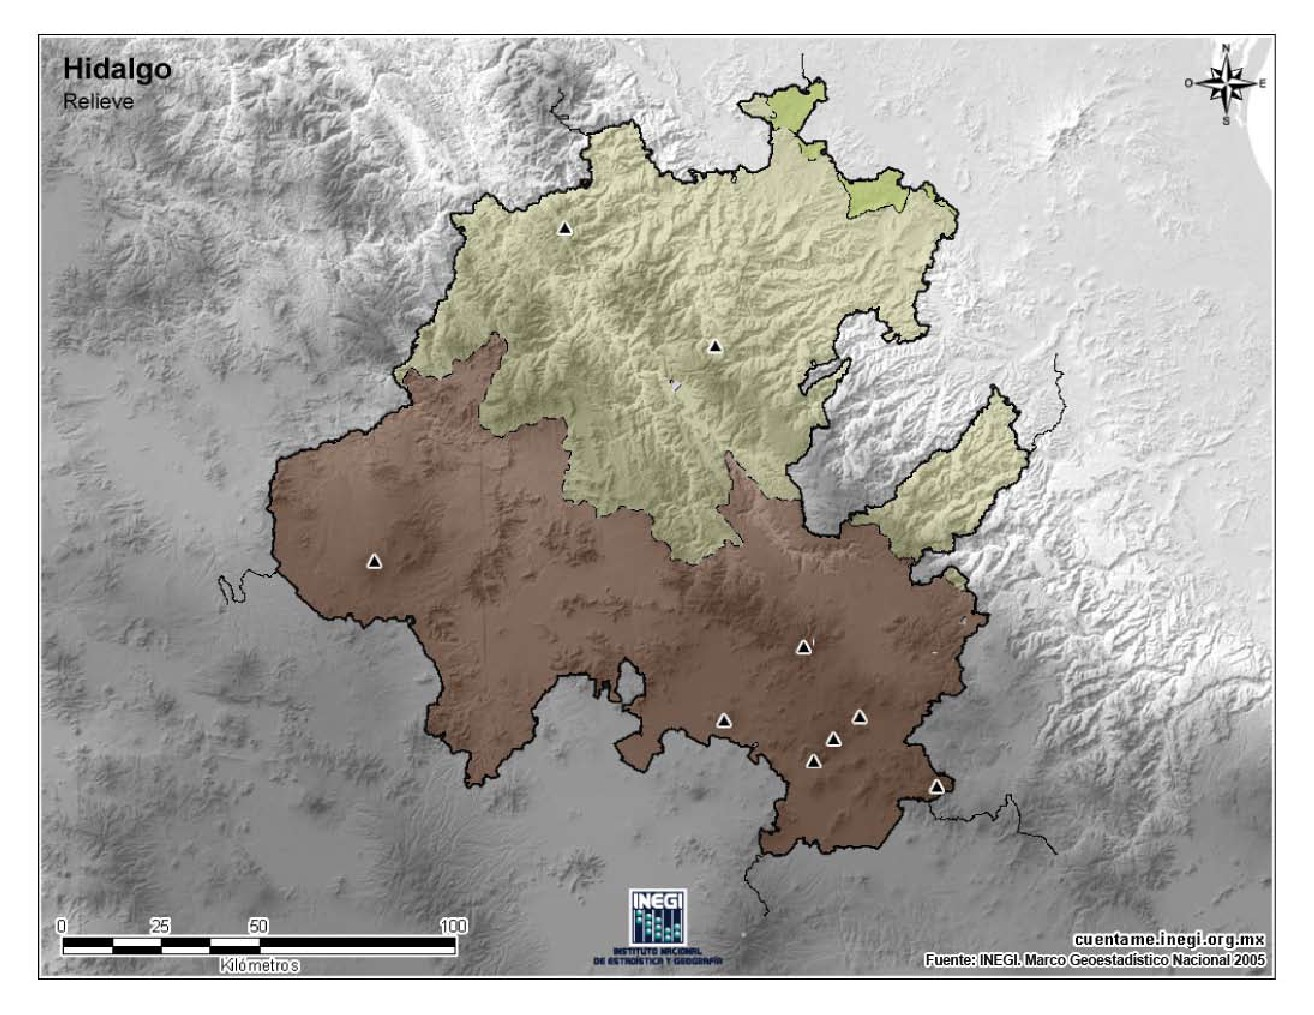 Mapa mudo de montañas de Hidalgo. INEGI de México